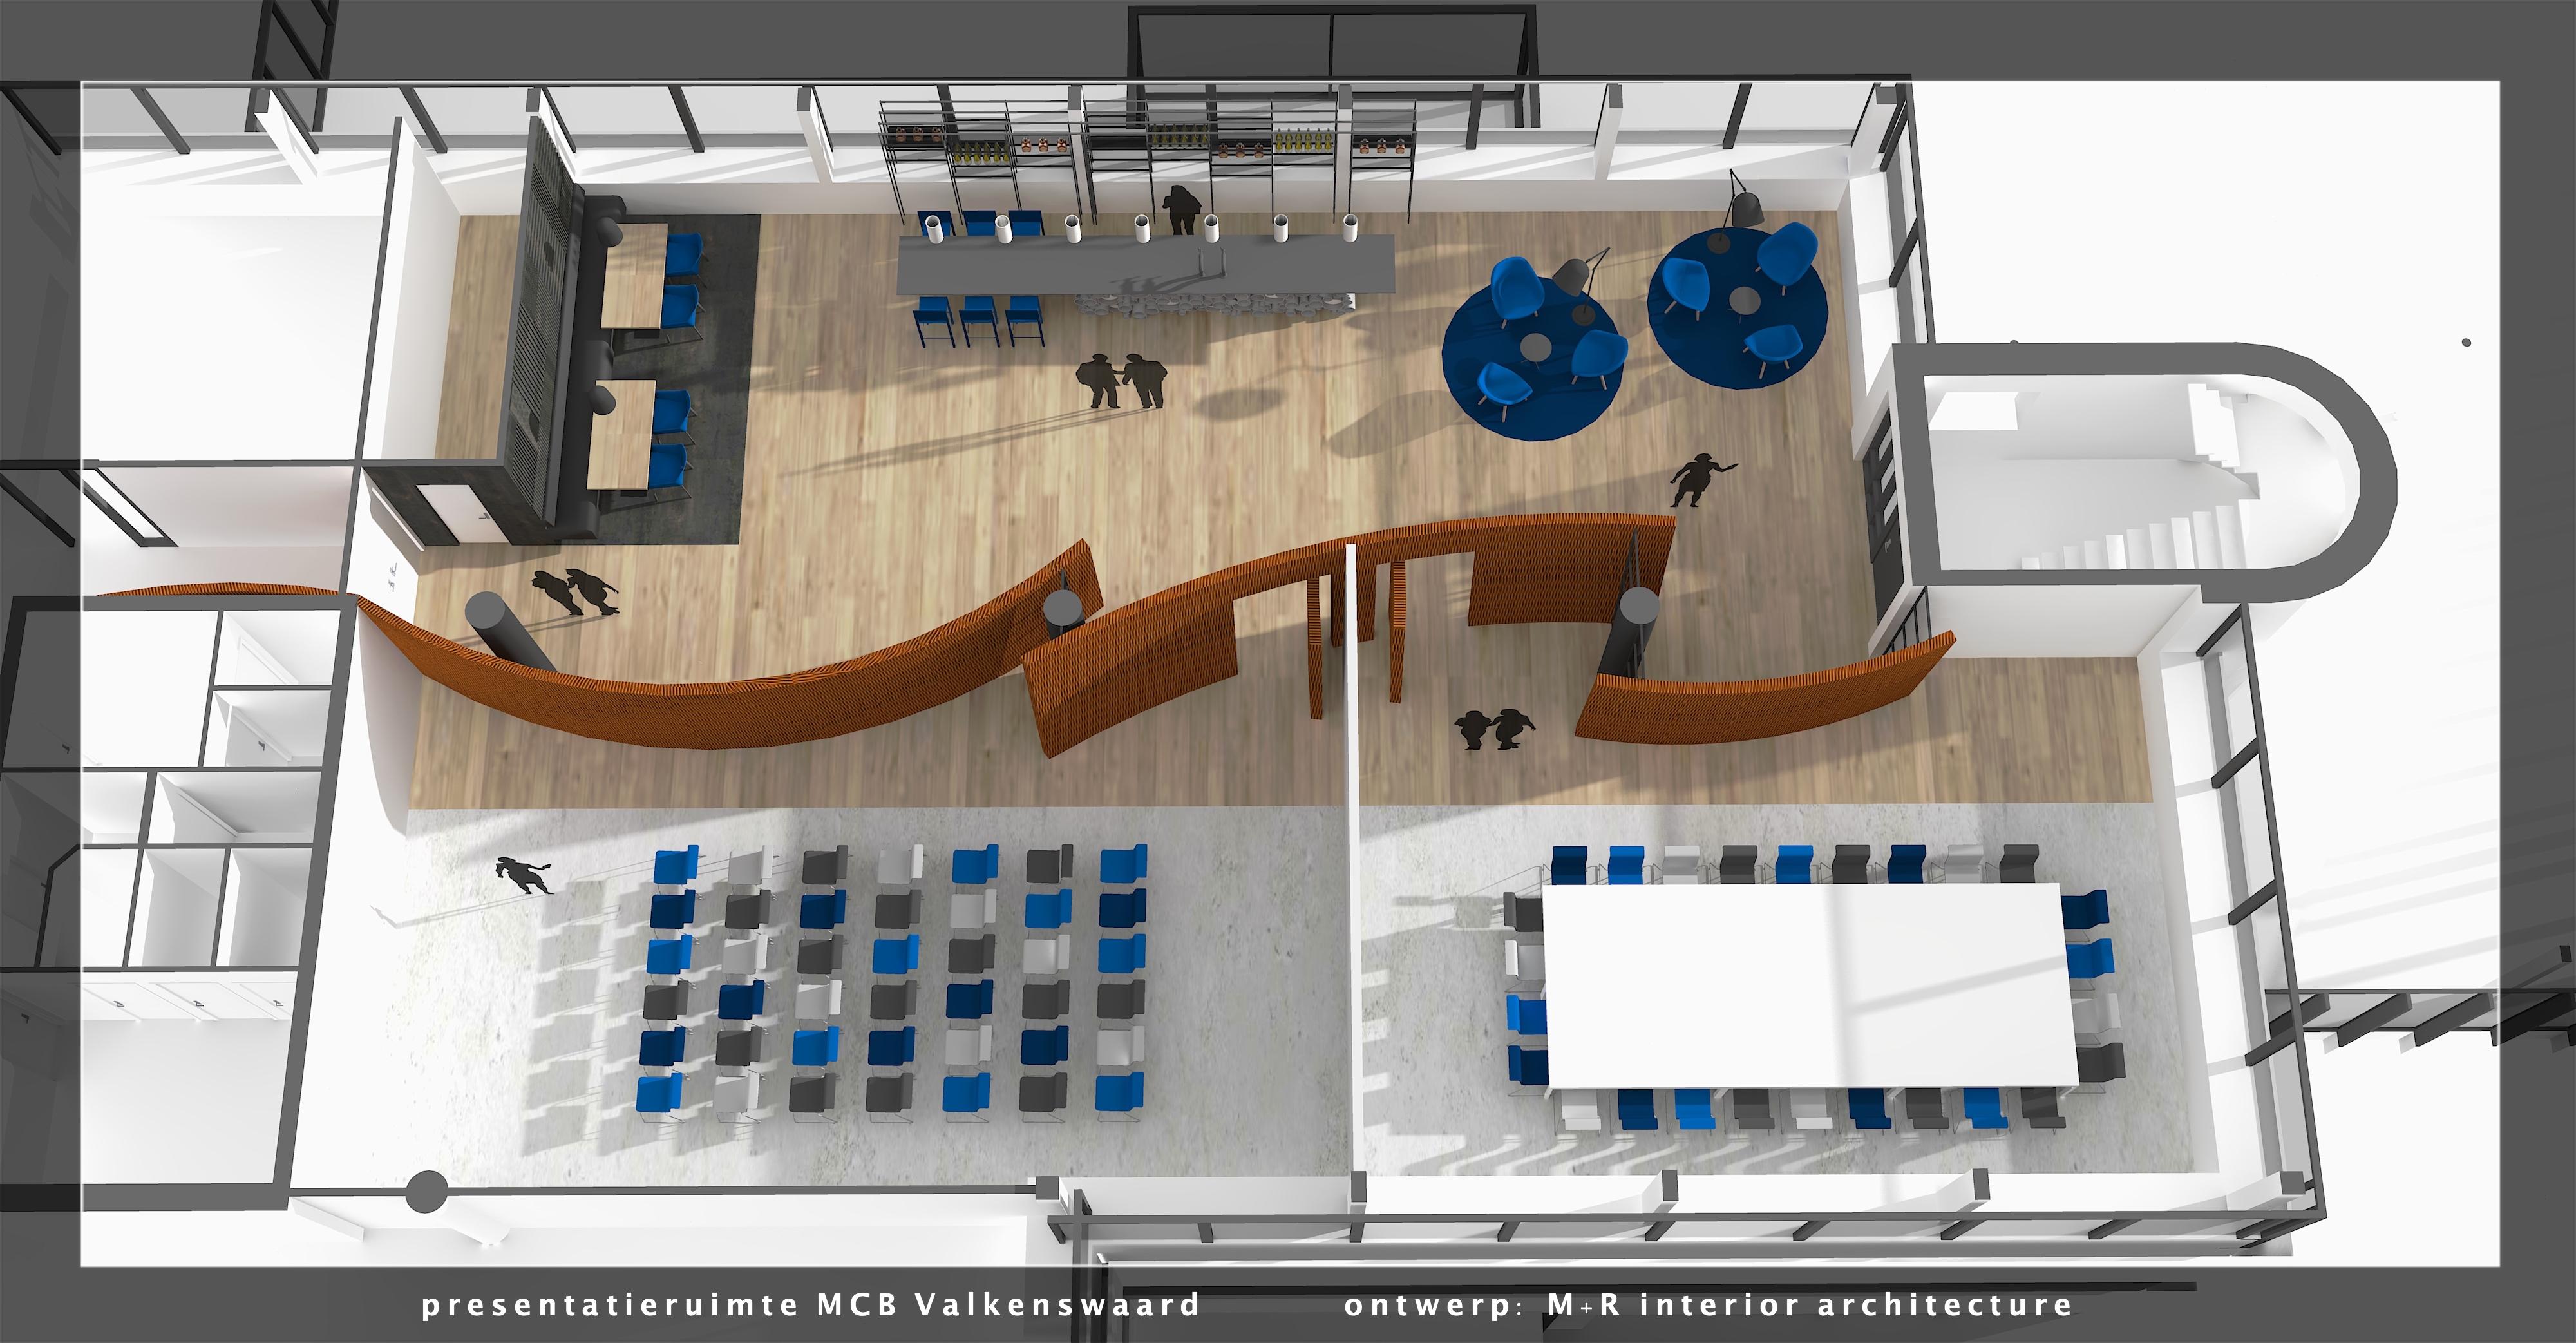 <p>impressie 3D MCB presentatieruimte by M+R</p>